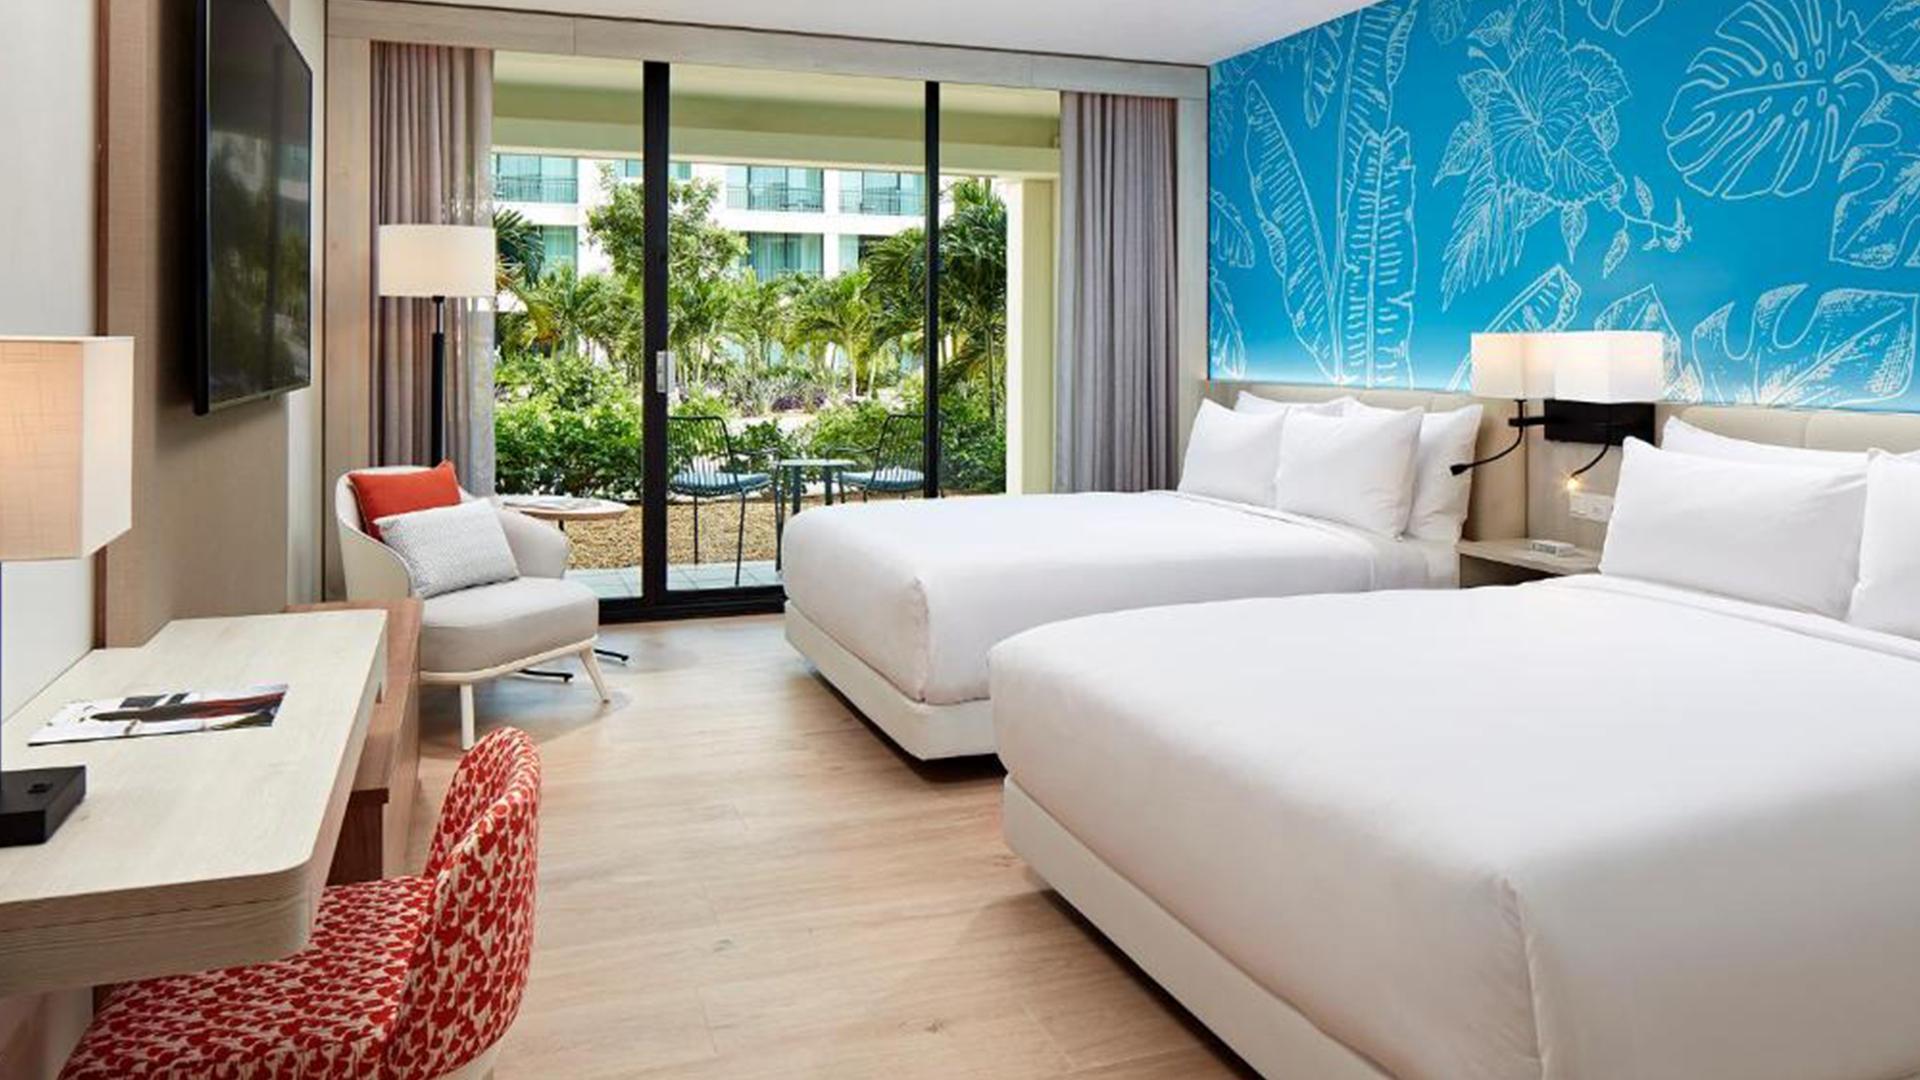 Garden View Queen Room image 1 at Curaçao Marriott Beach Resort by null, Curaçao, Curaçao